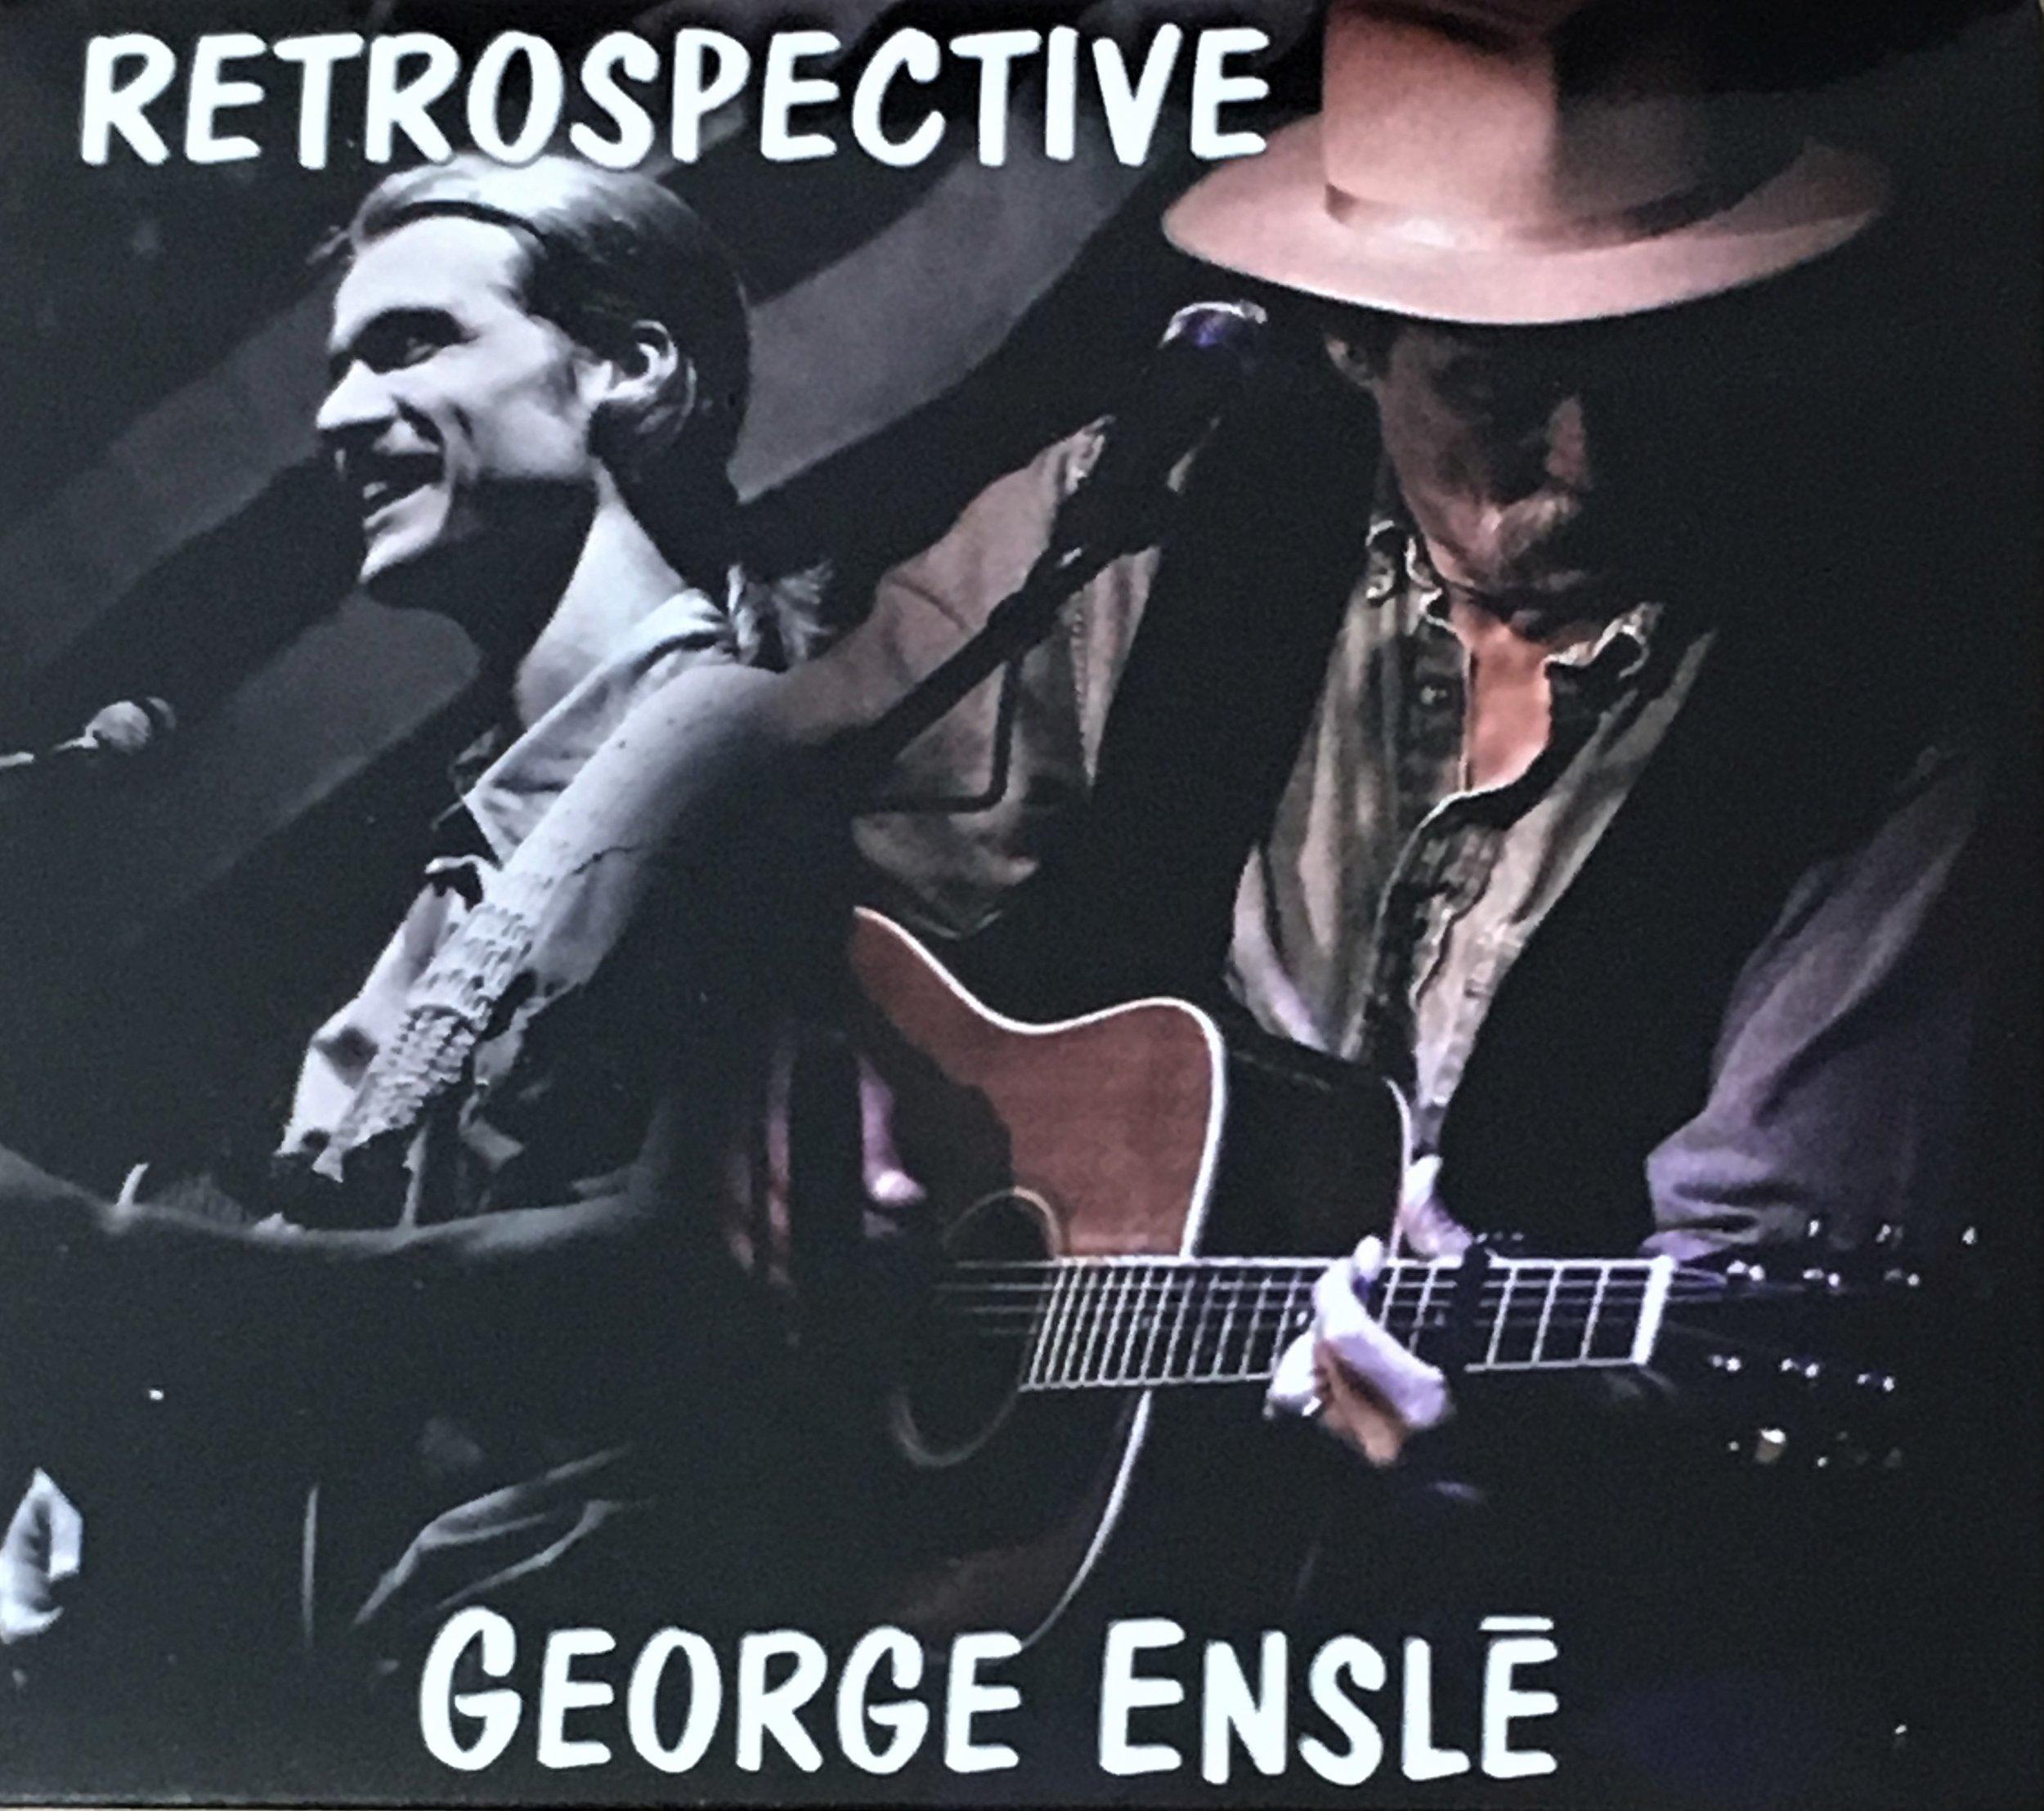 Retrospective - Berkalin 2017